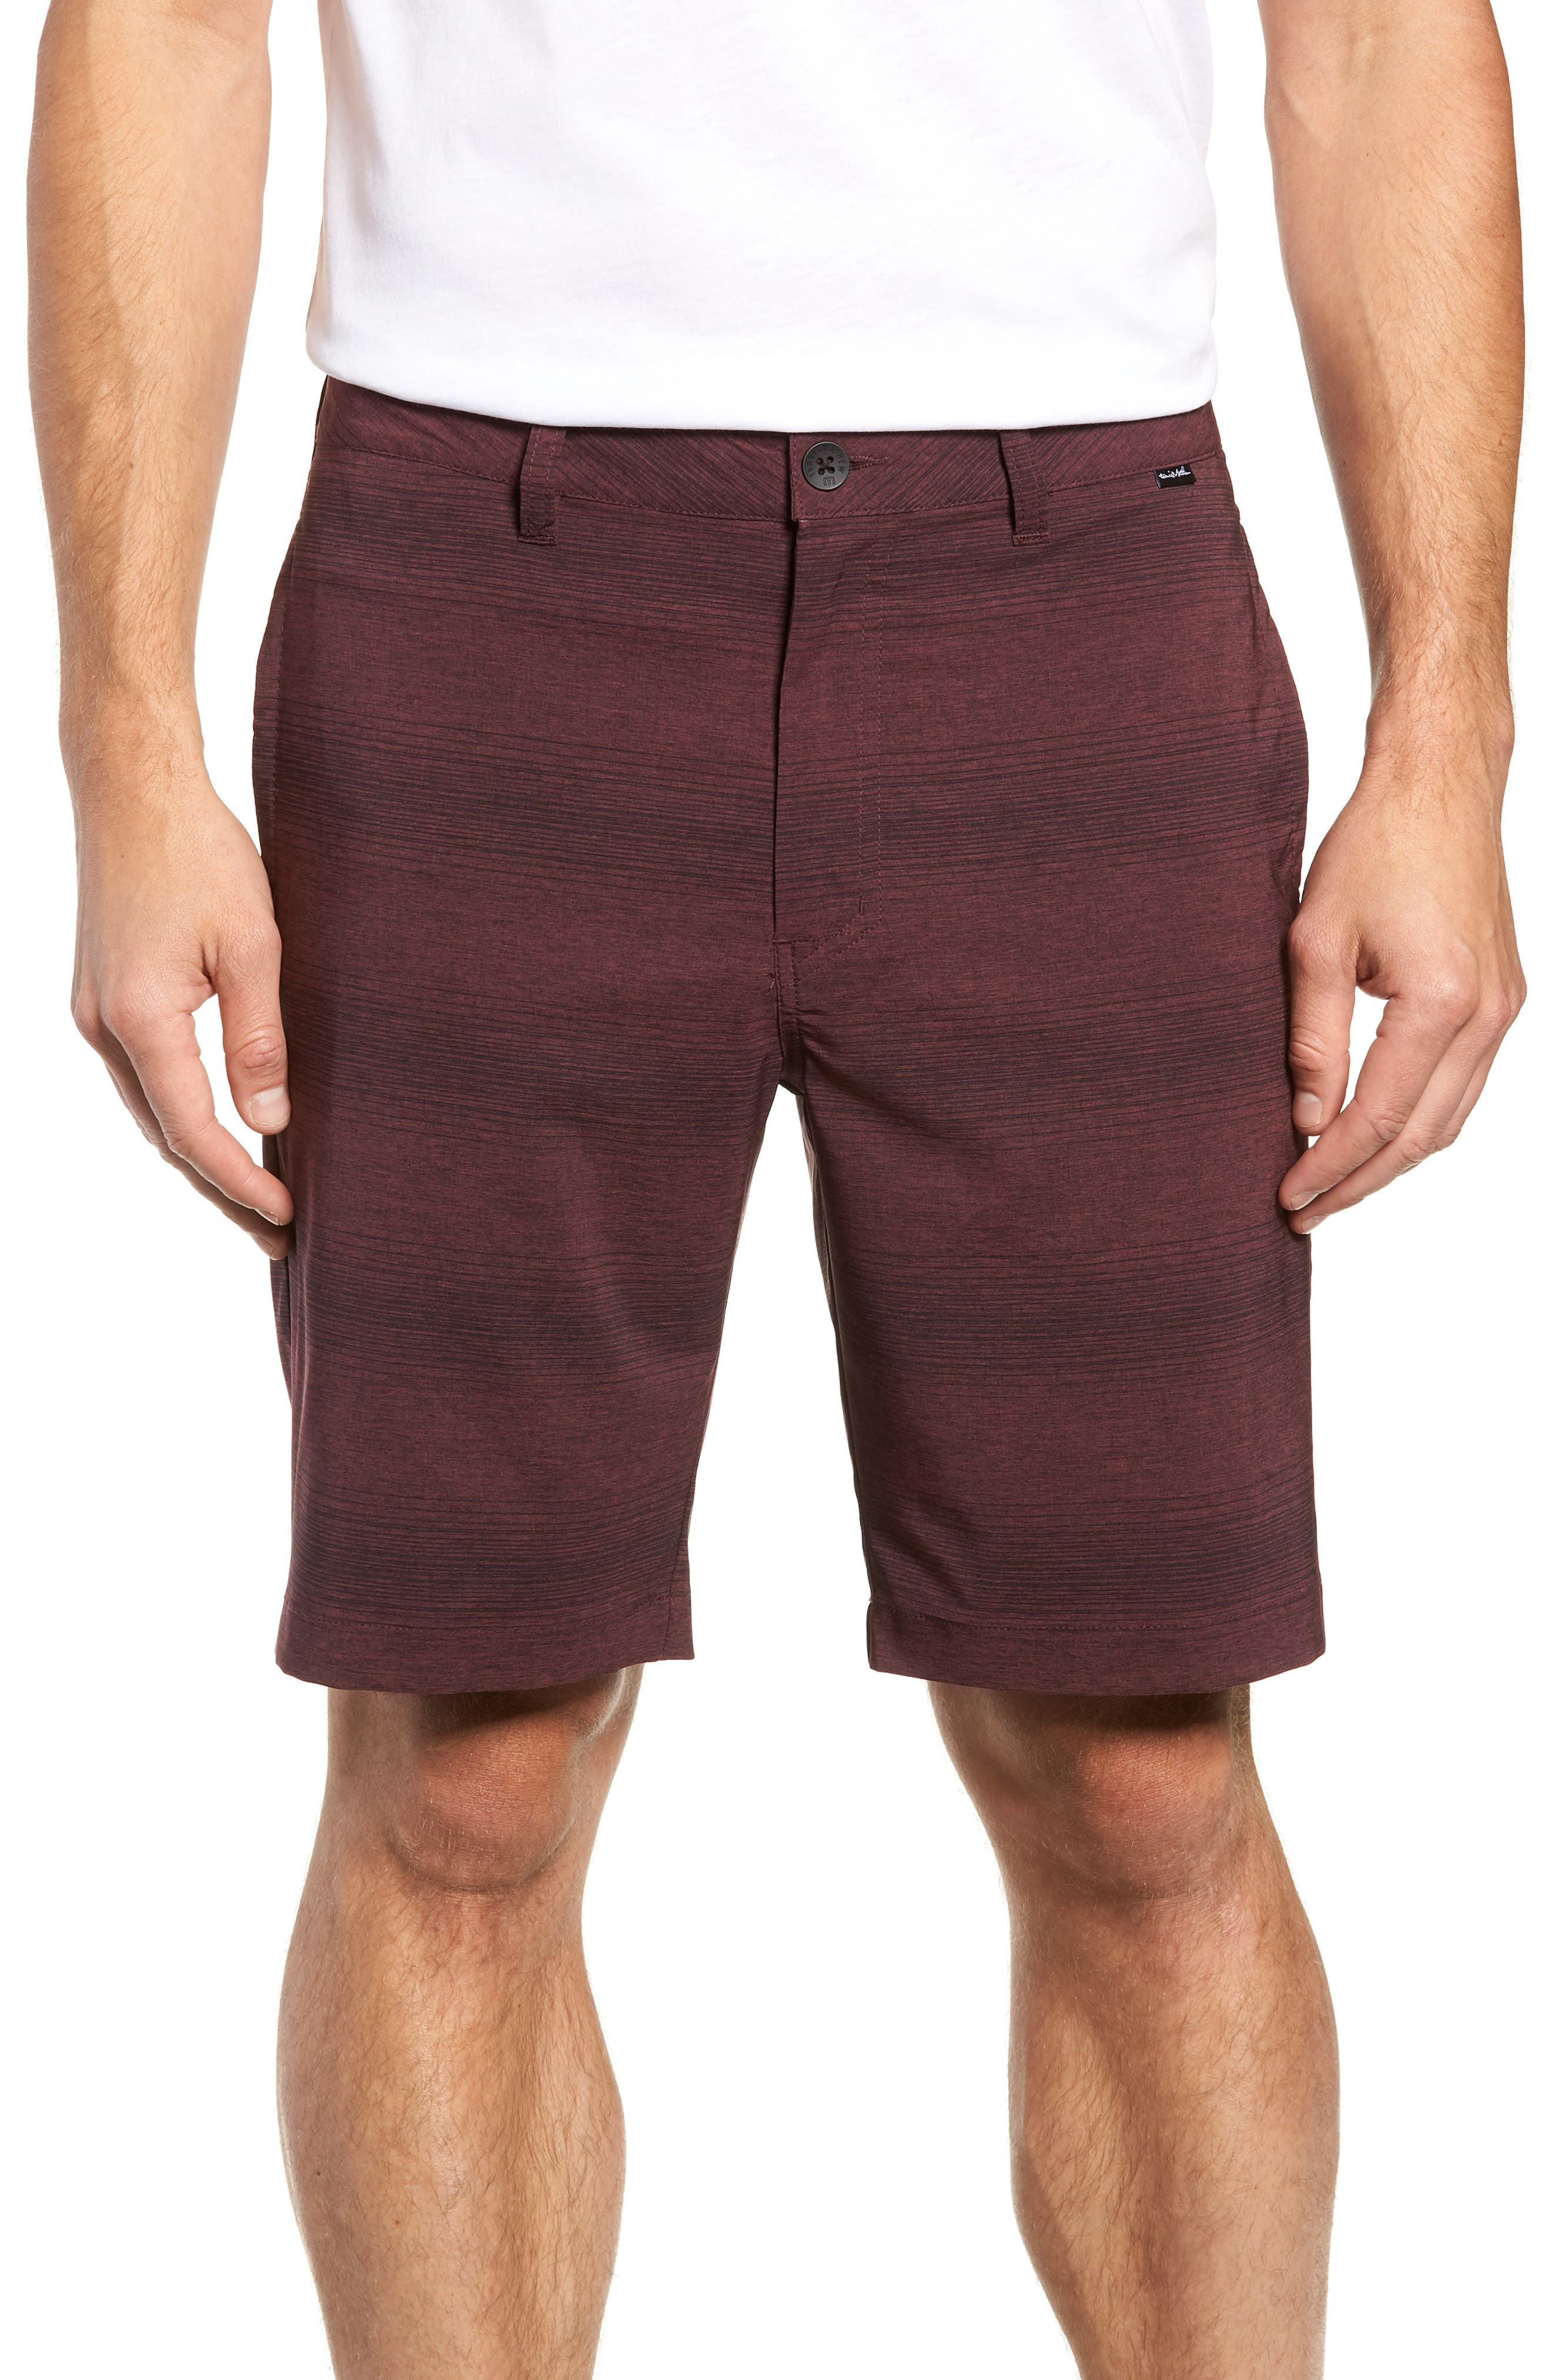 TRAVISMATHEW Tepic Shorts, Main, color, WINETASTING/ BLACK